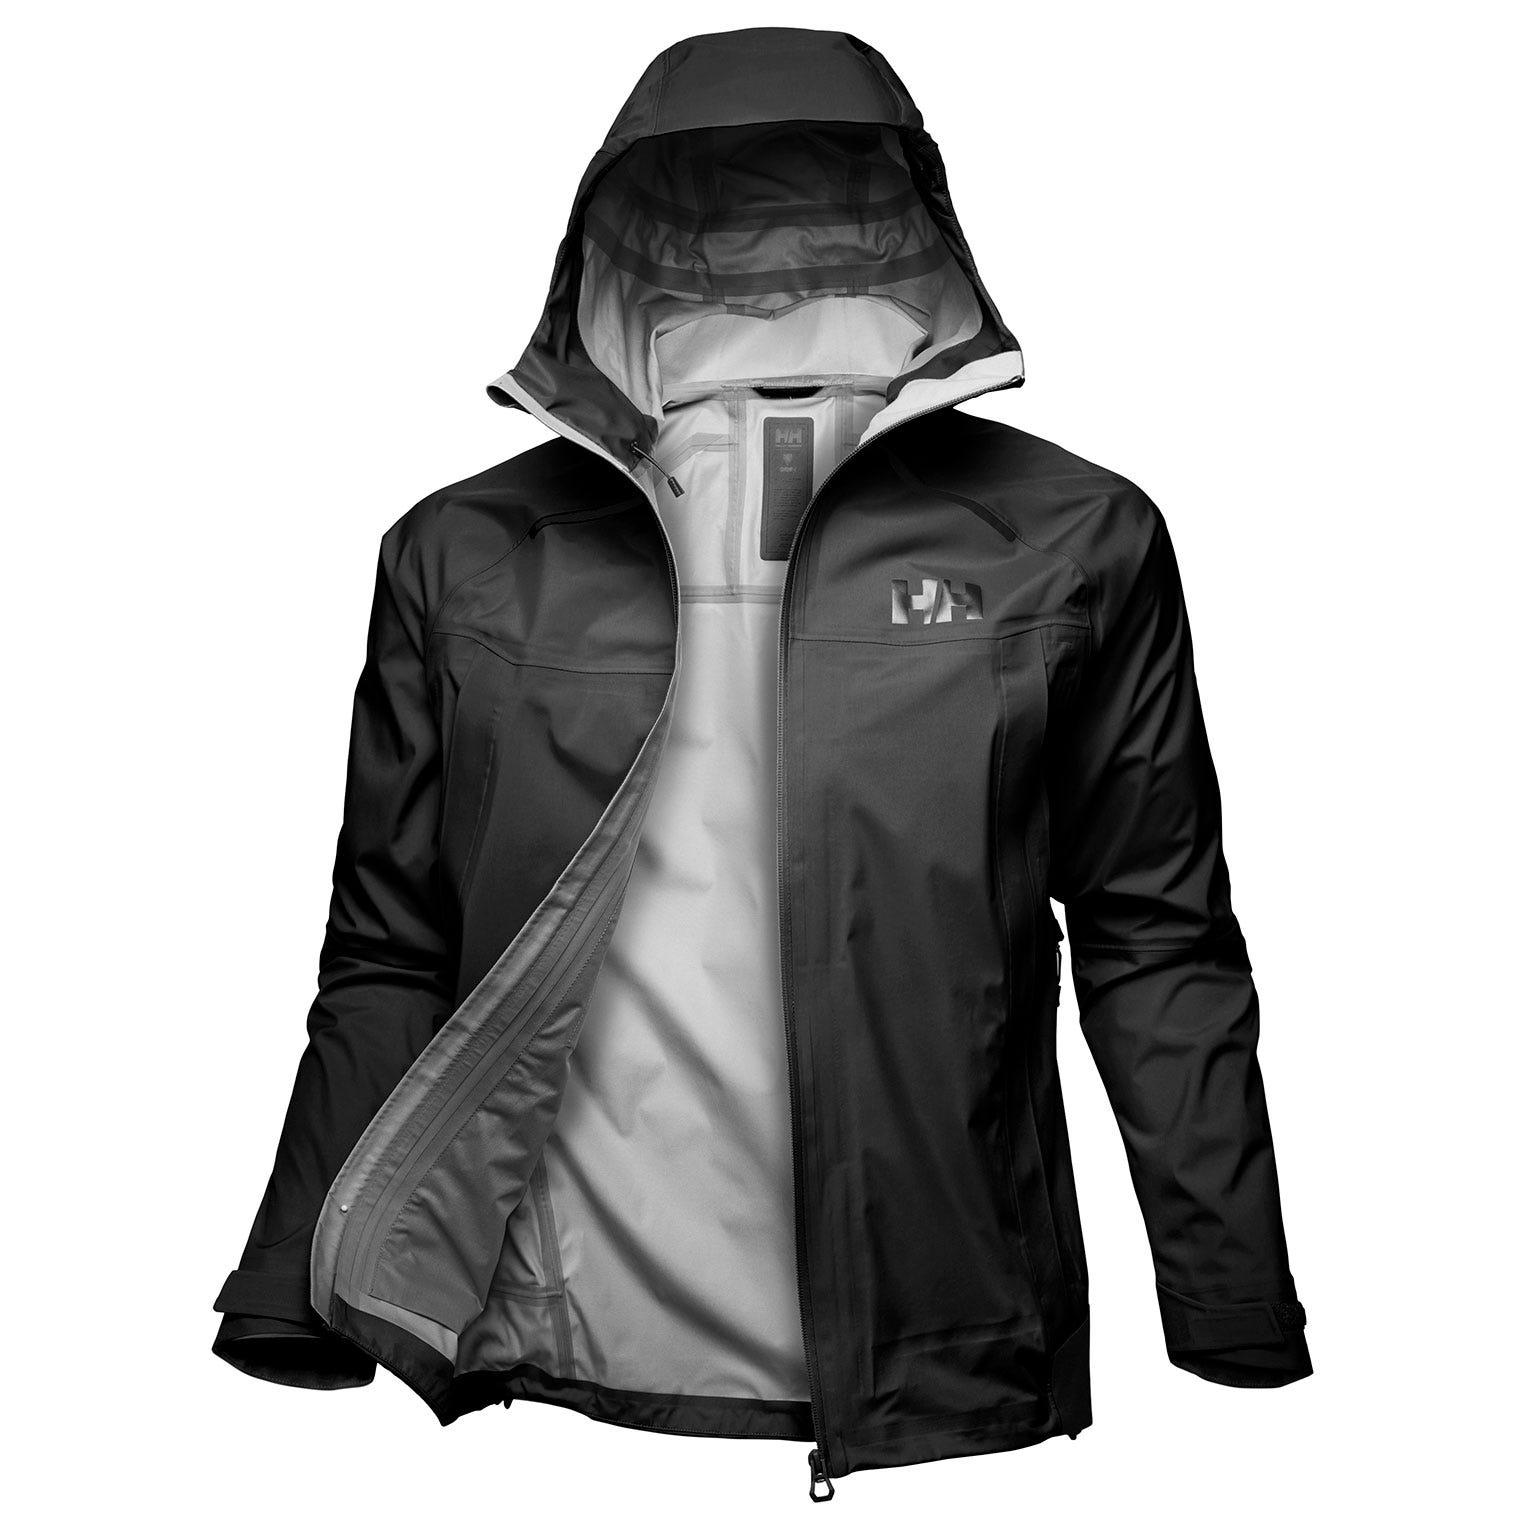 Helly Hansen Odin 9 Worlds Jacket Mens Hiking Black M